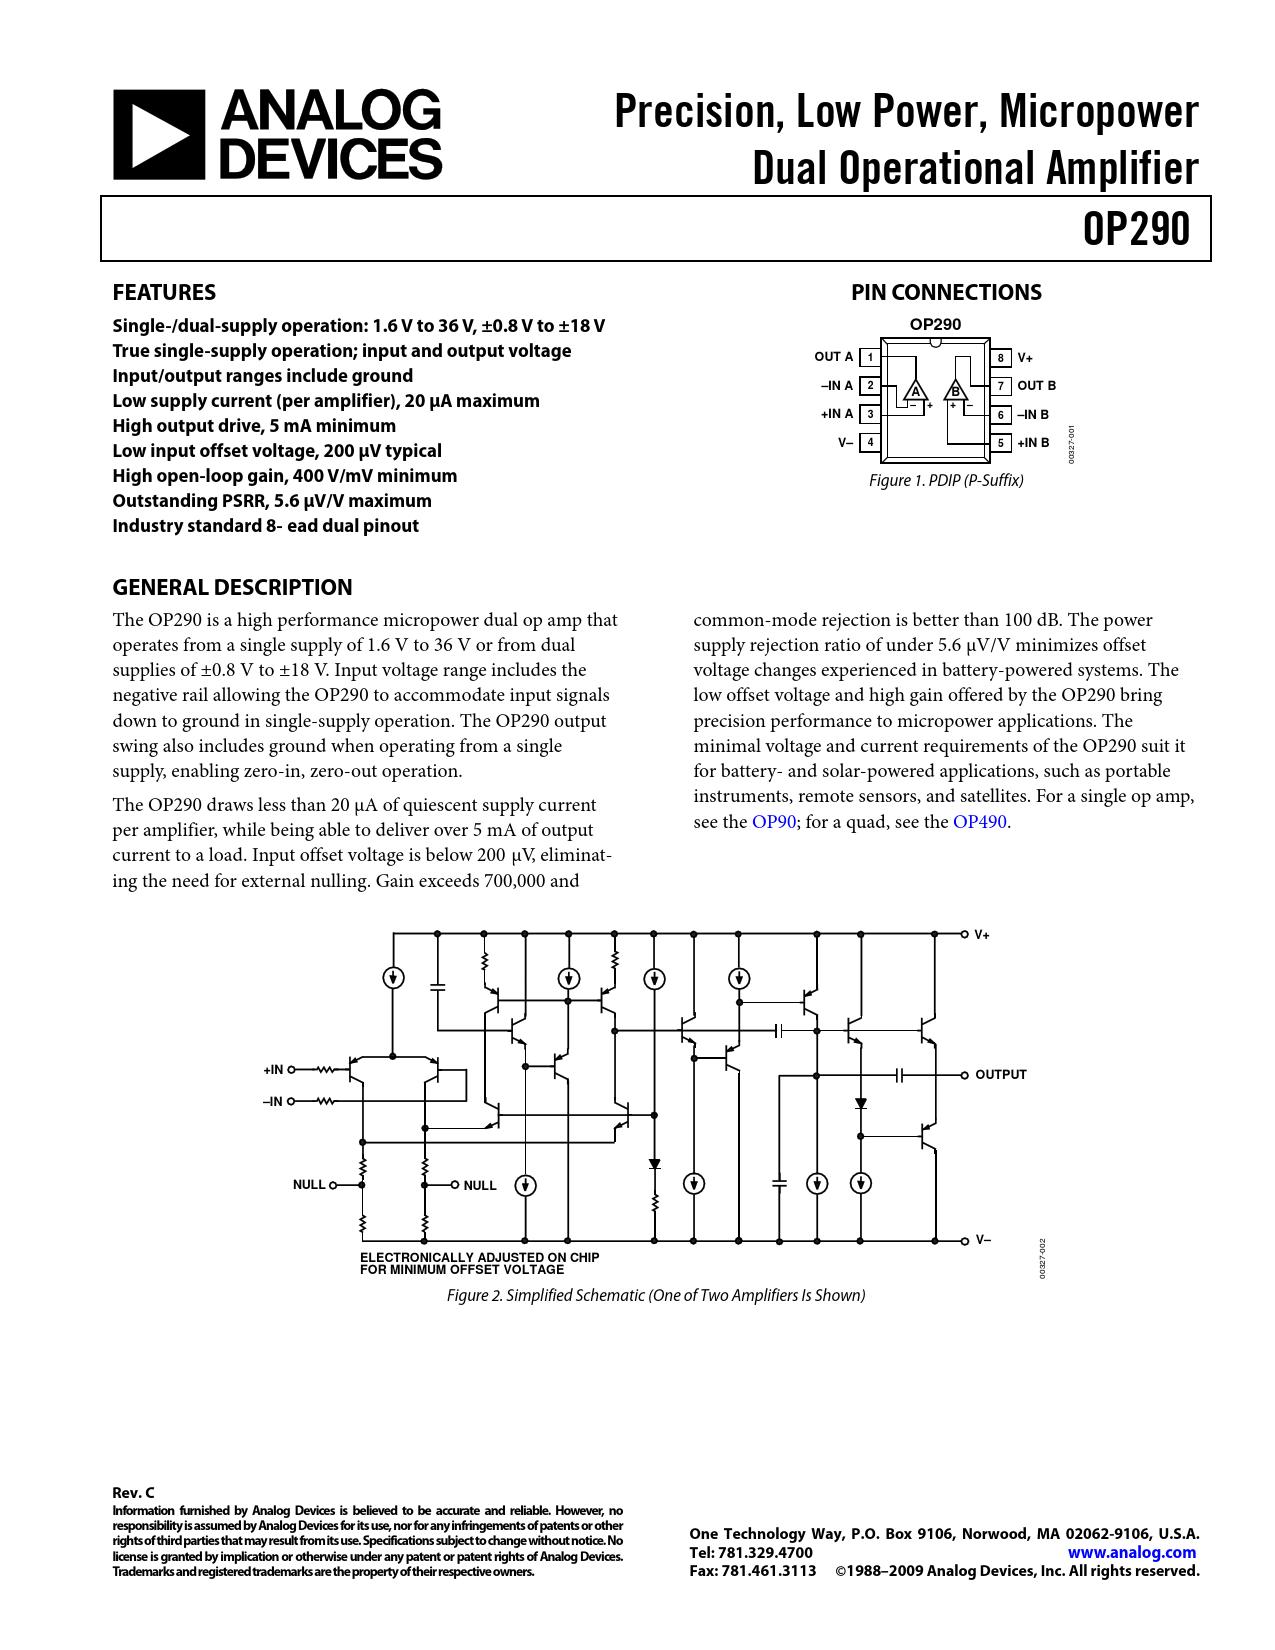 Datasheet OP290 Analog Devices, Версия: C